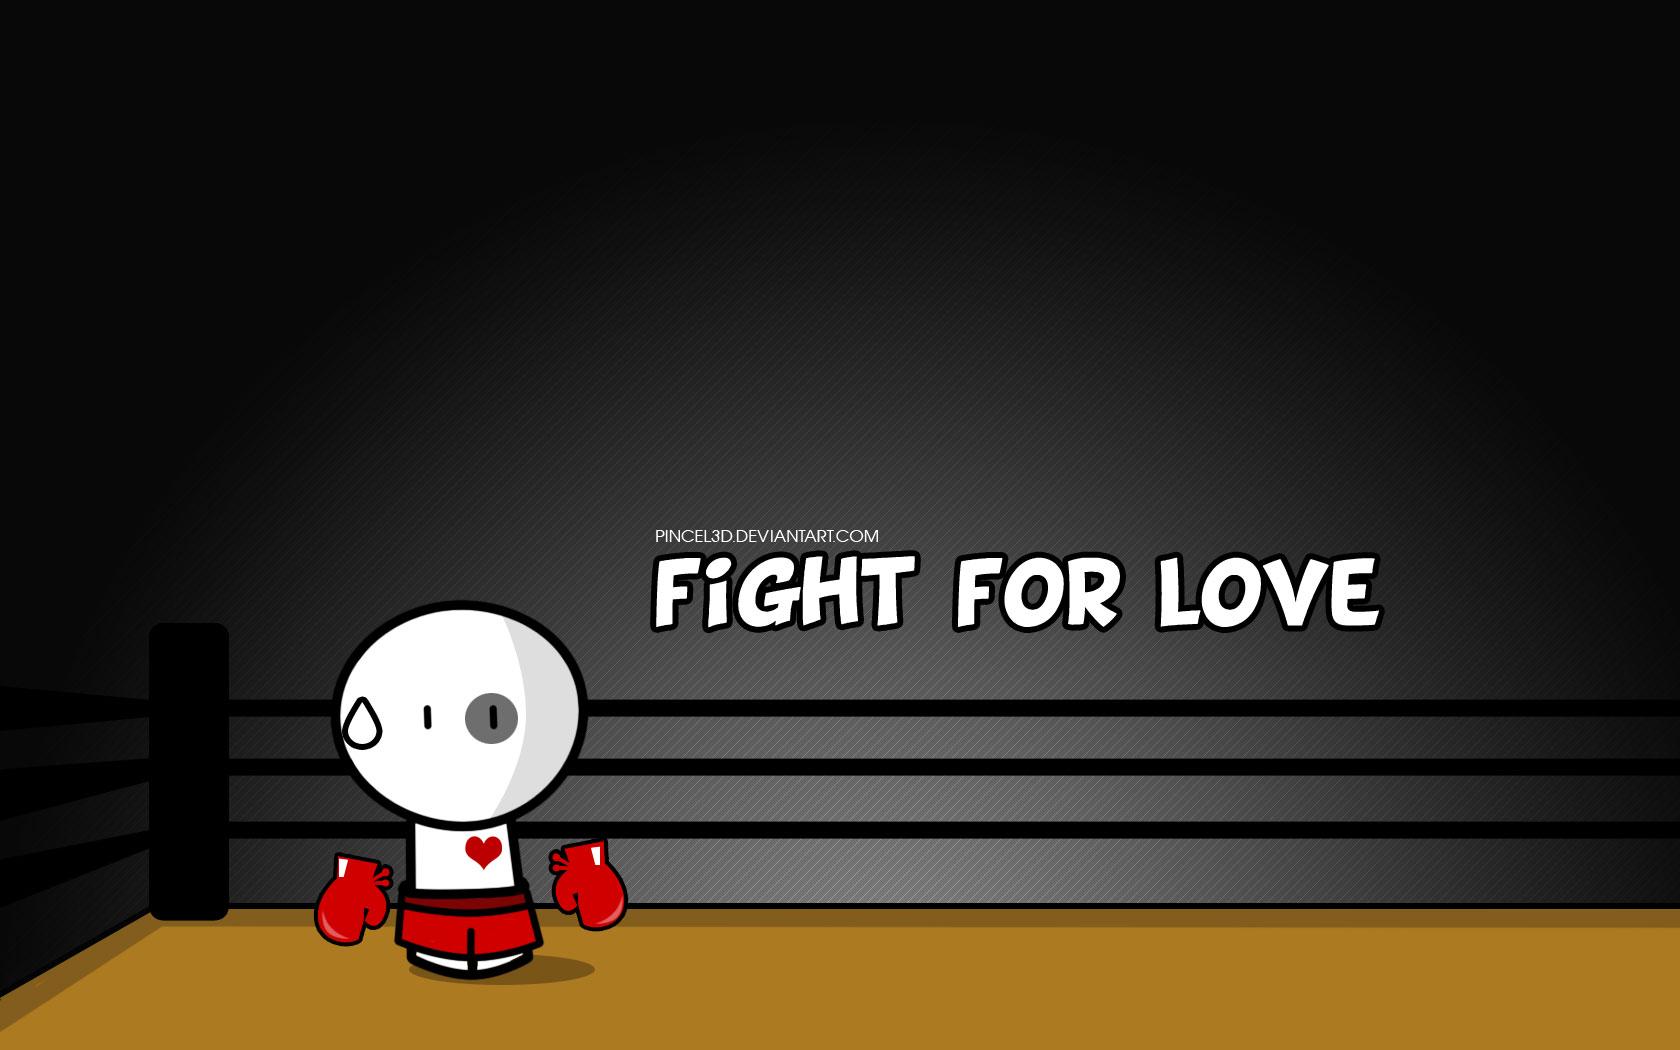 http://fc03.deviantart.net/fs41/f/2009/007/5/2/Fight_for_love_by_pincel3d.jpg